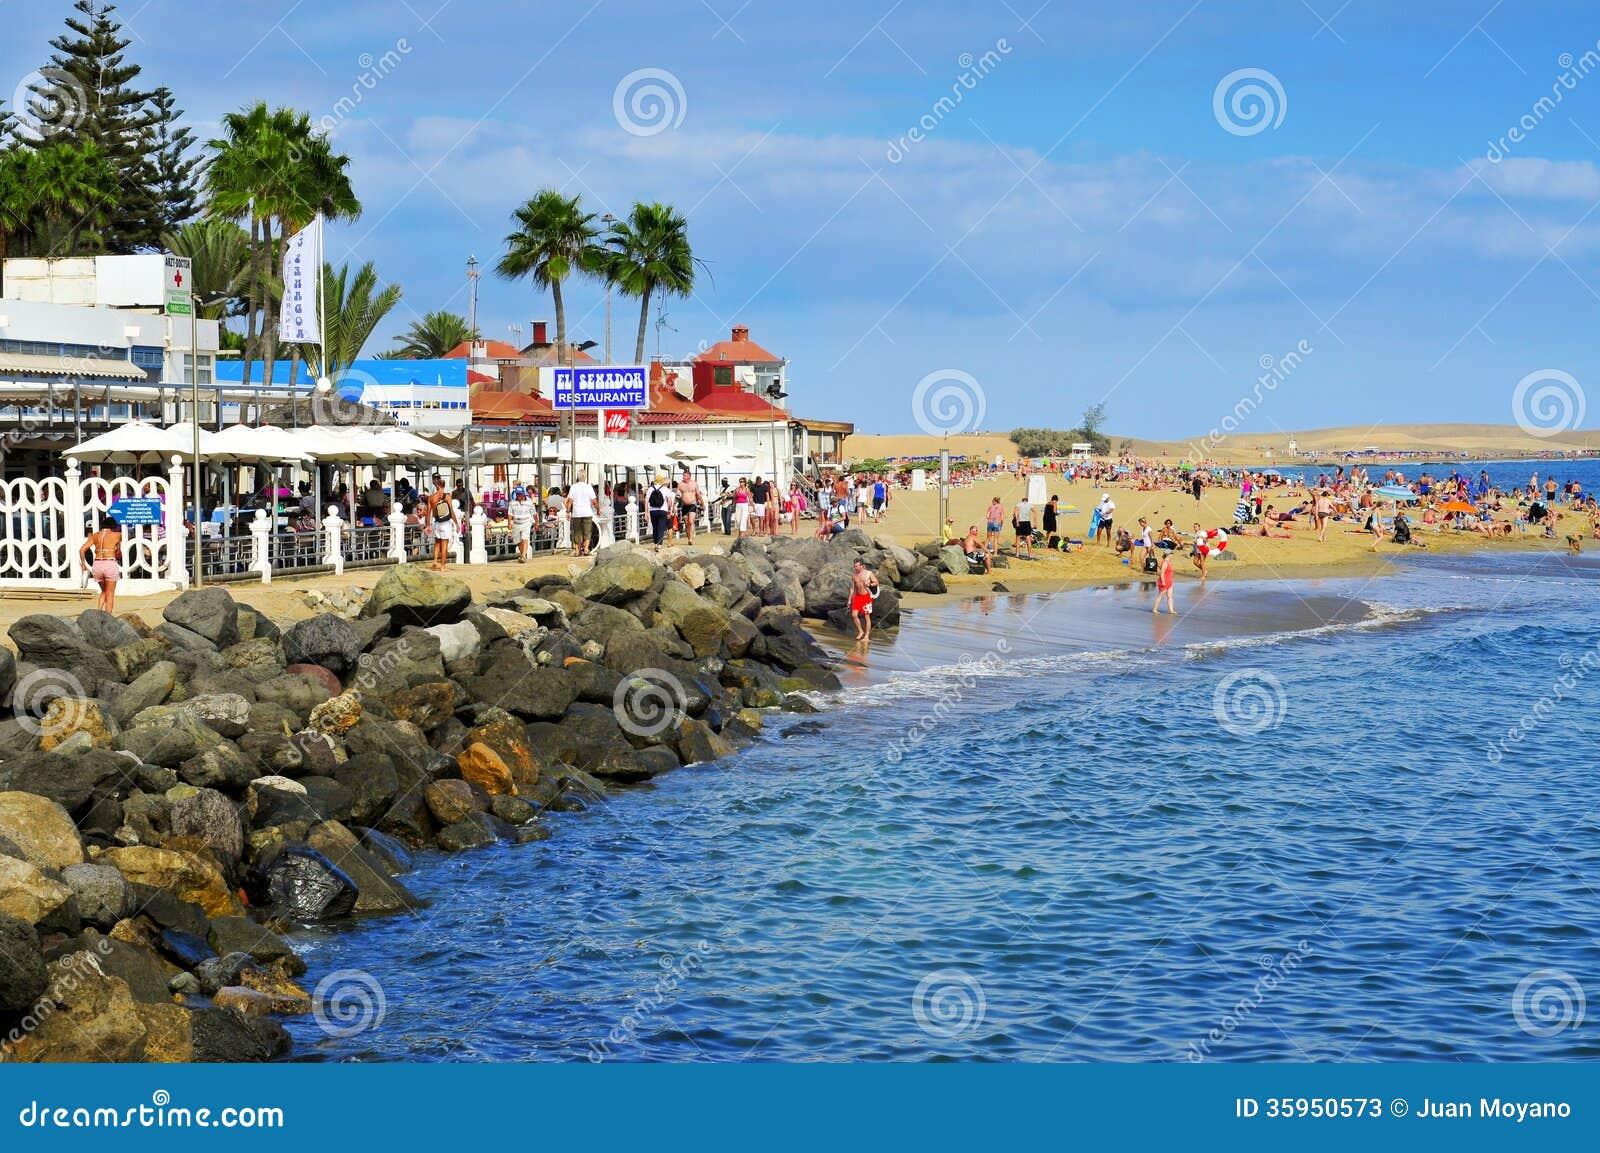 Playa DE Maspalomas strand in Maspalomas, Gran Canaria, Spanje